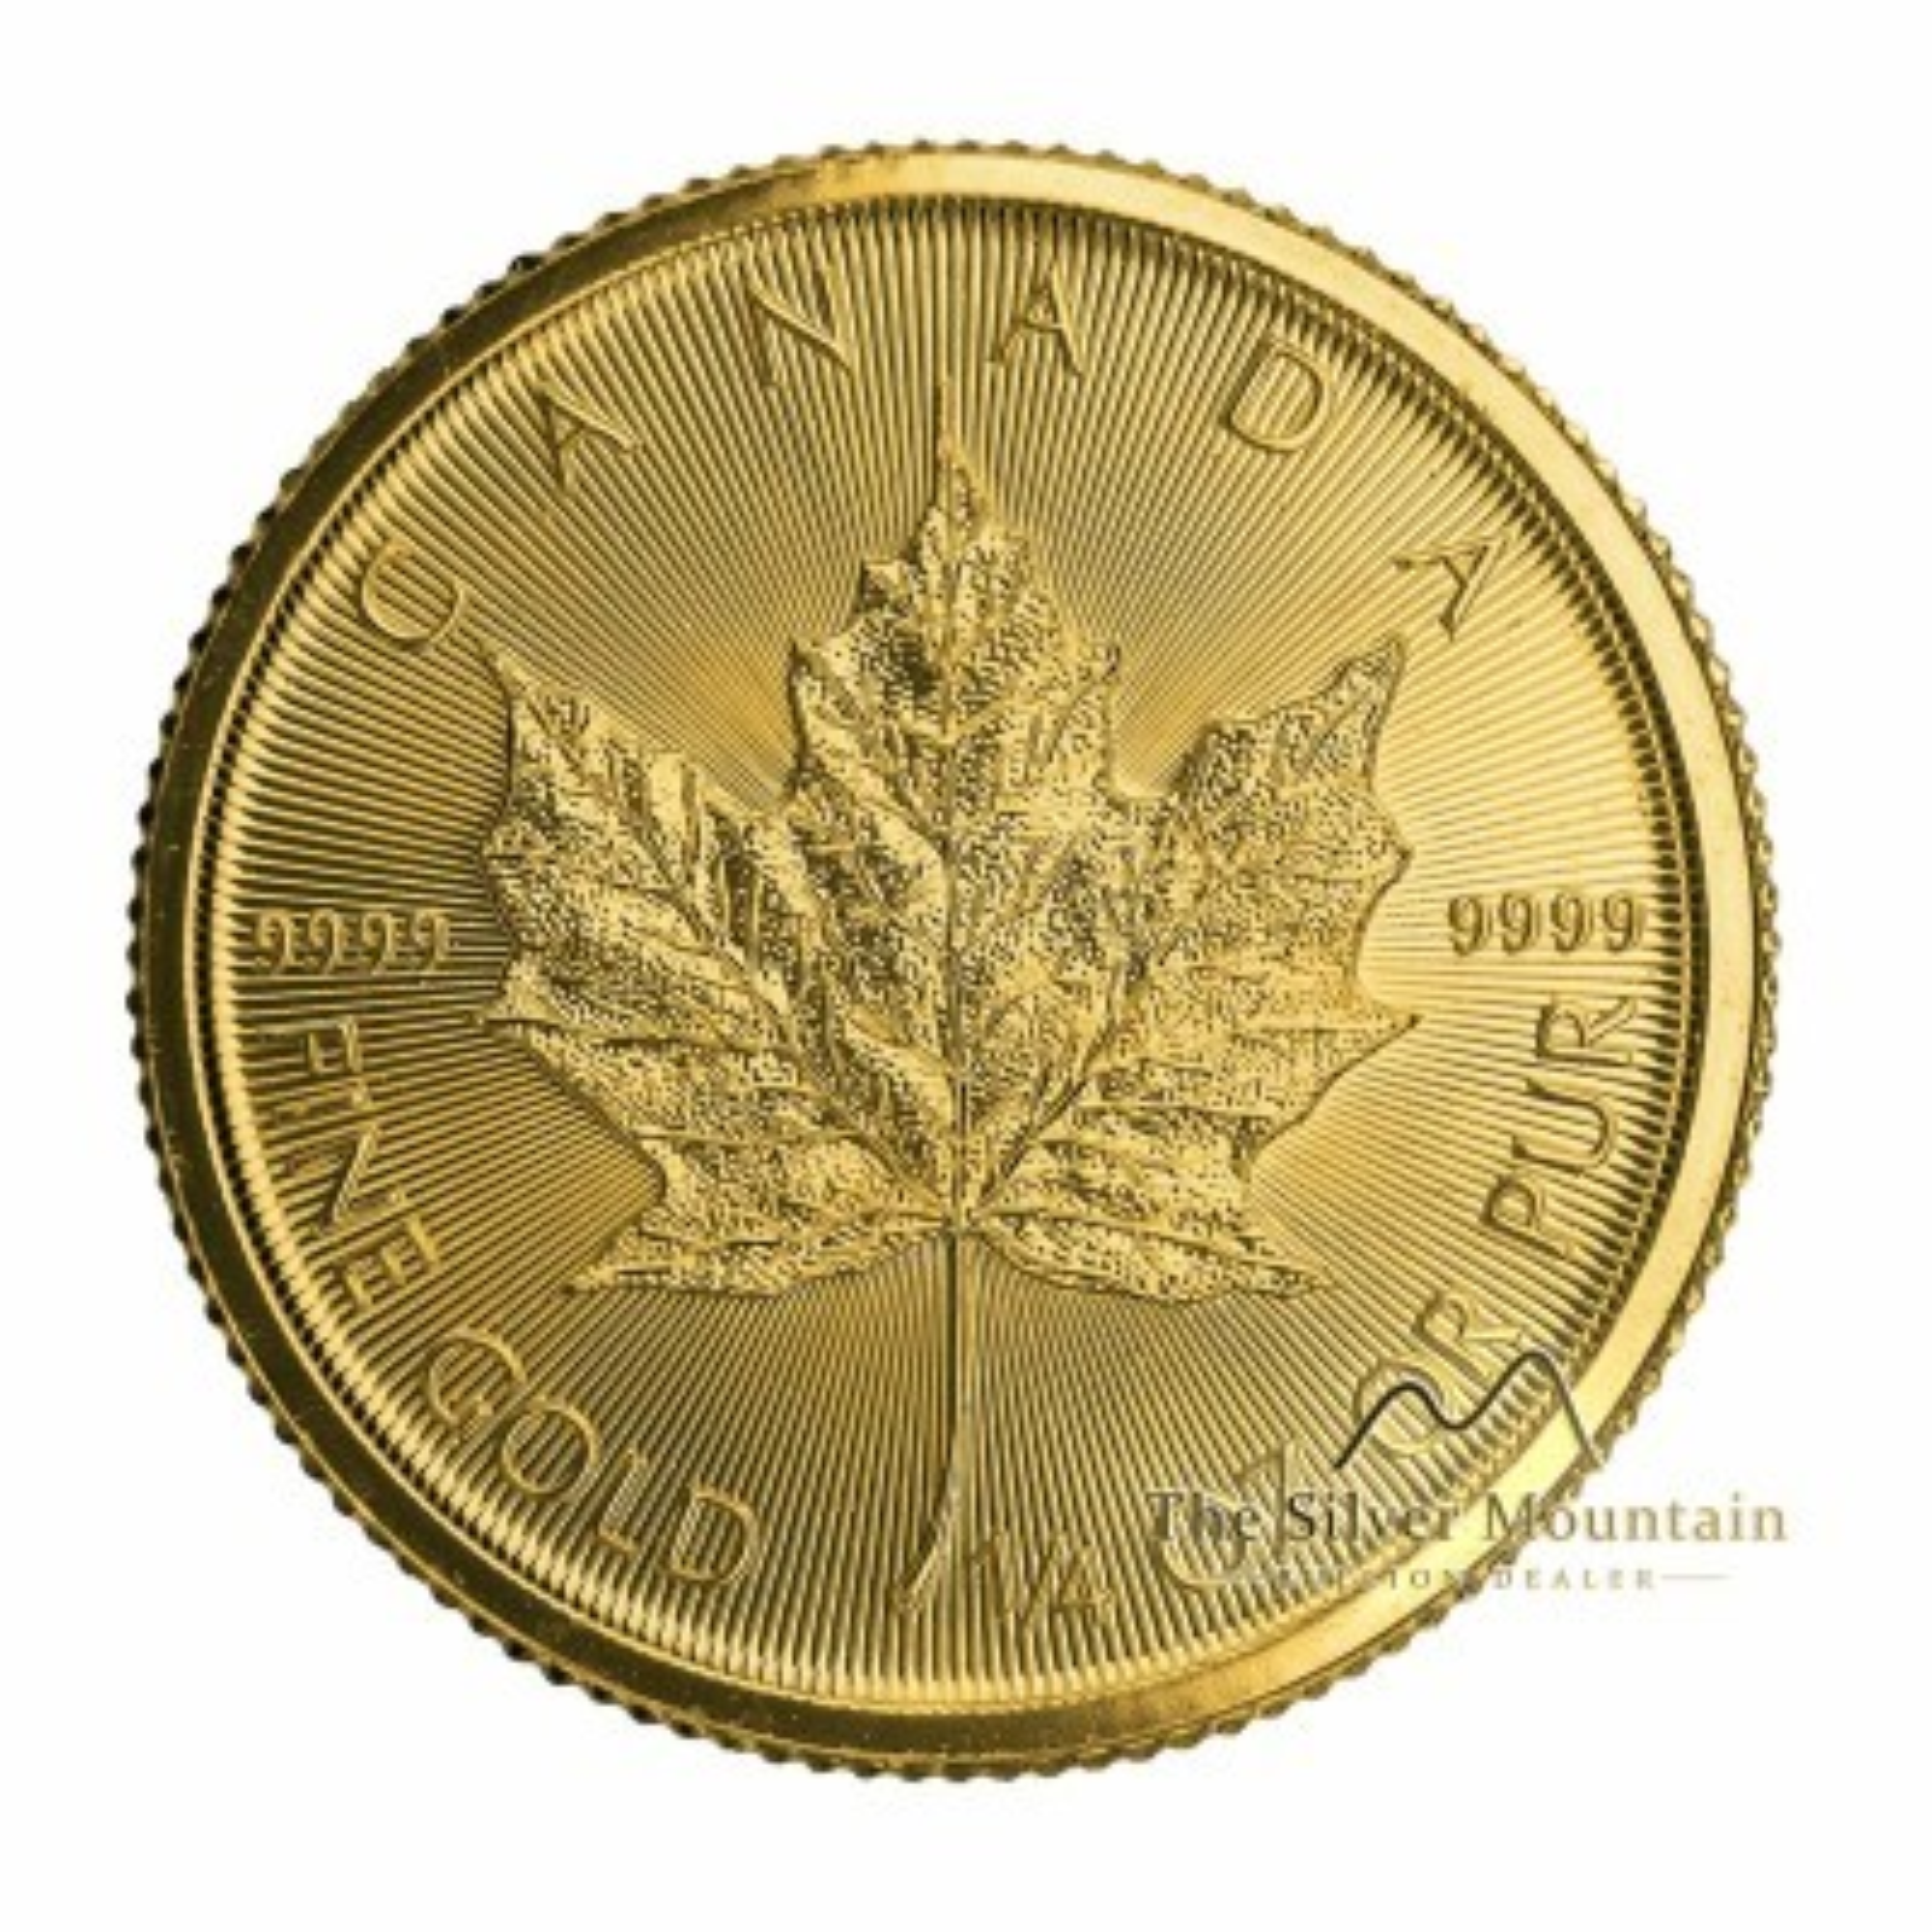 1/4 Troy ounce gold coin Maple Leaf 2019